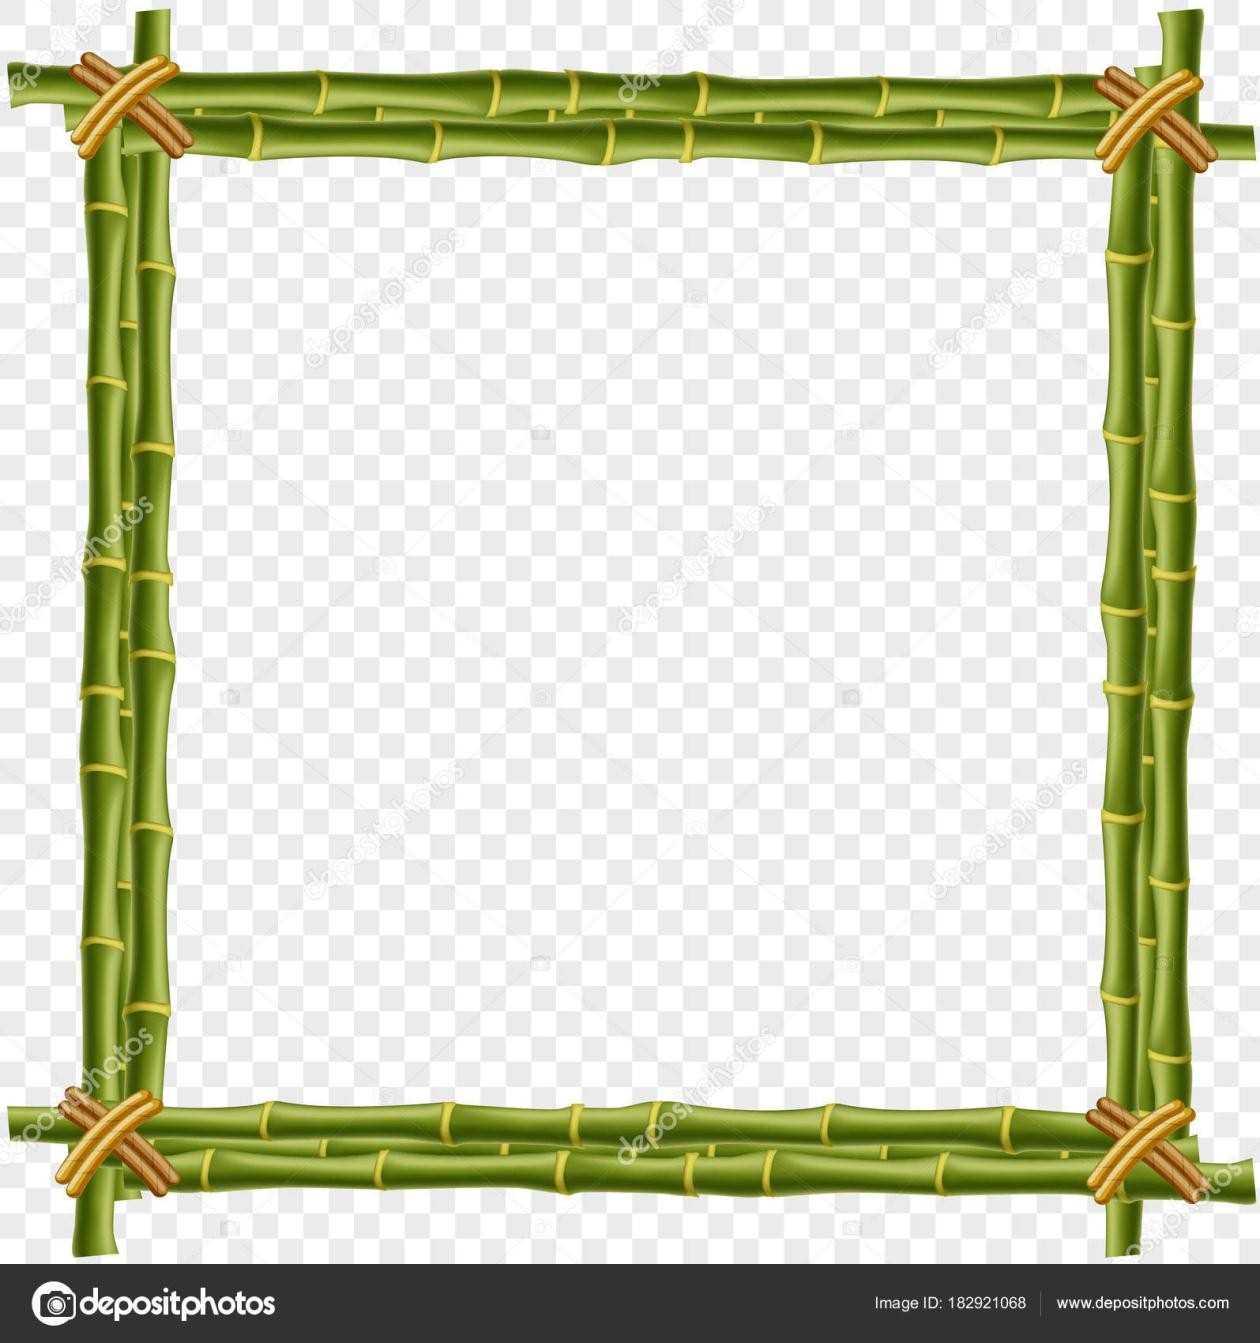 1260x1343 Vector Border Vector Art Illustration Stock Photo